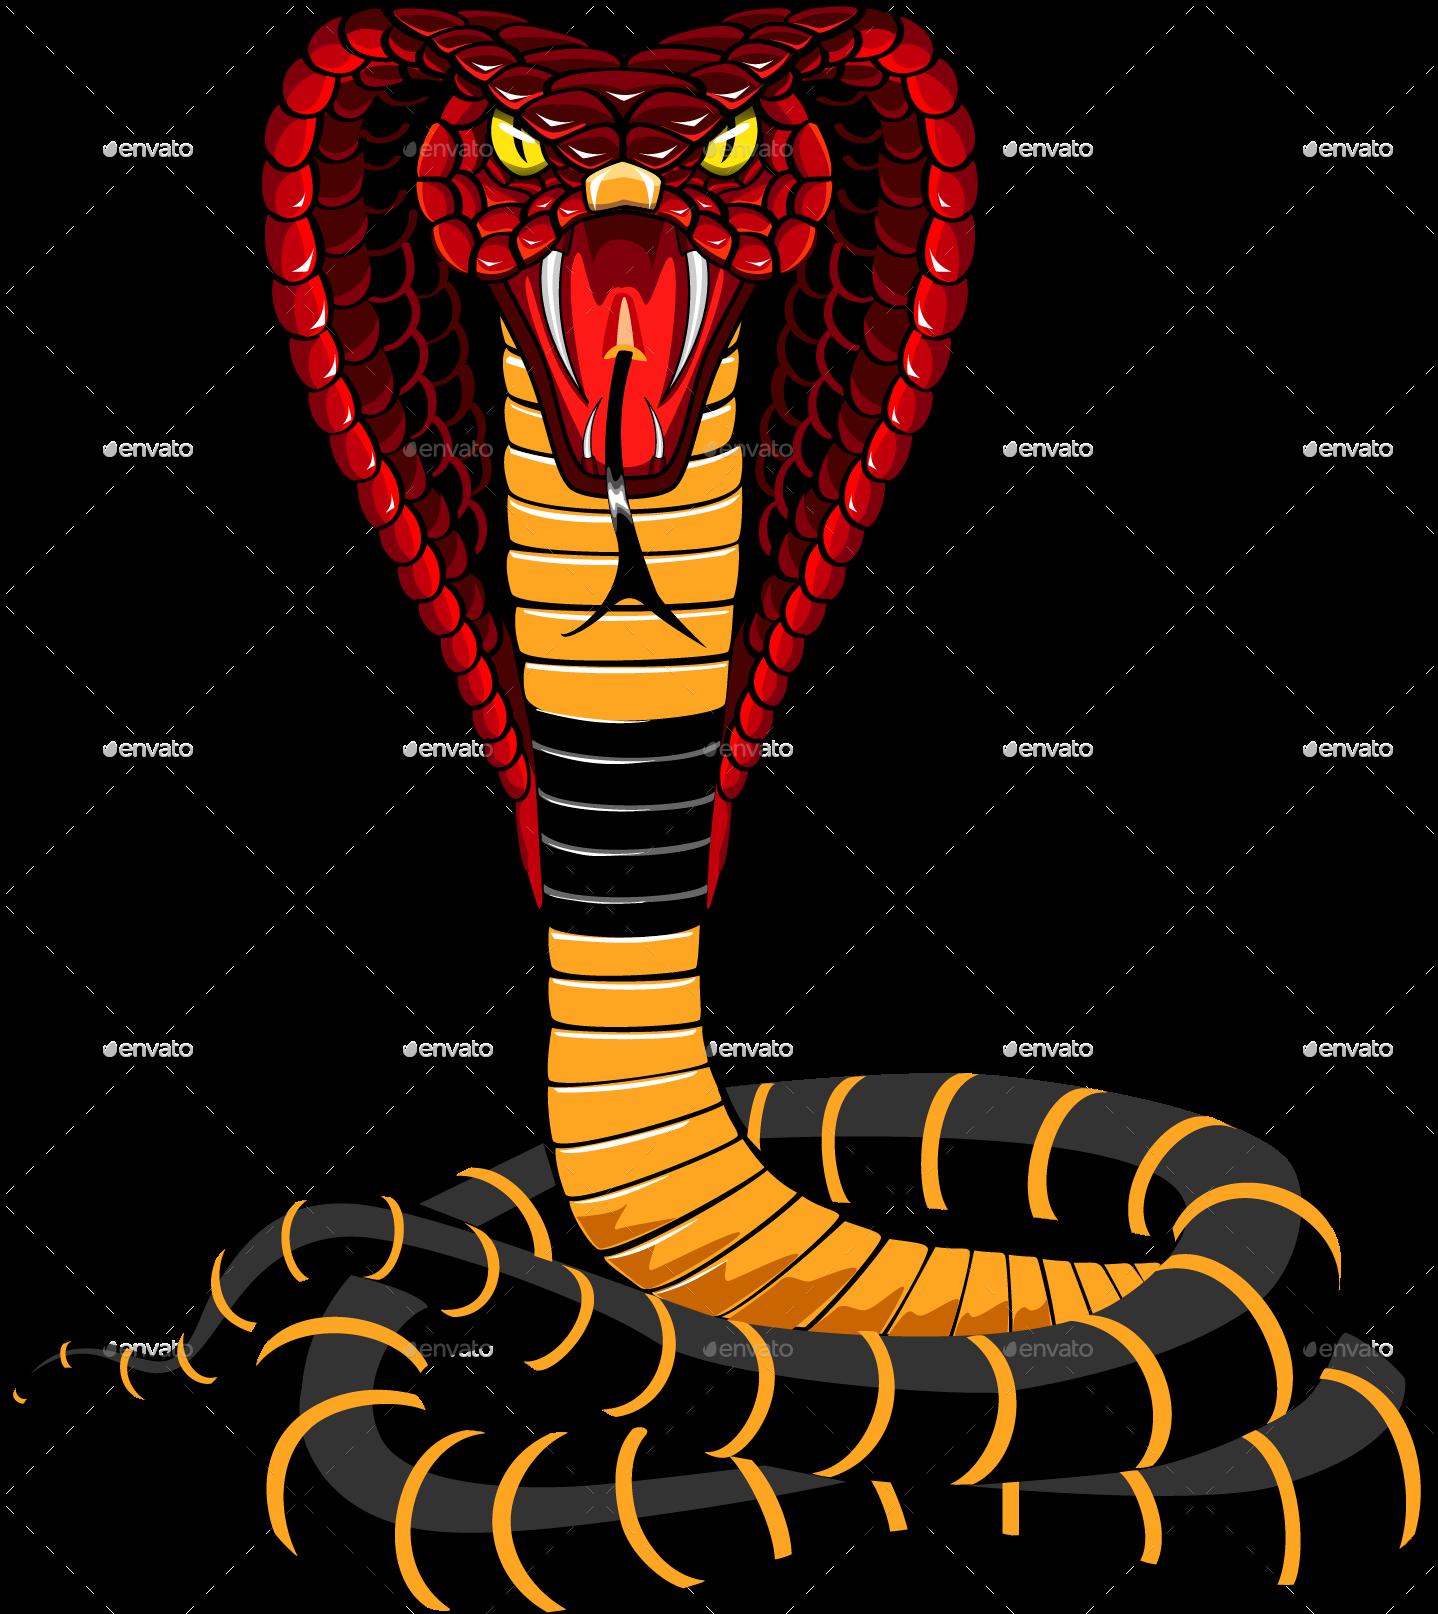 Cobra Snake Illustration By Ashmarka Graphicriver